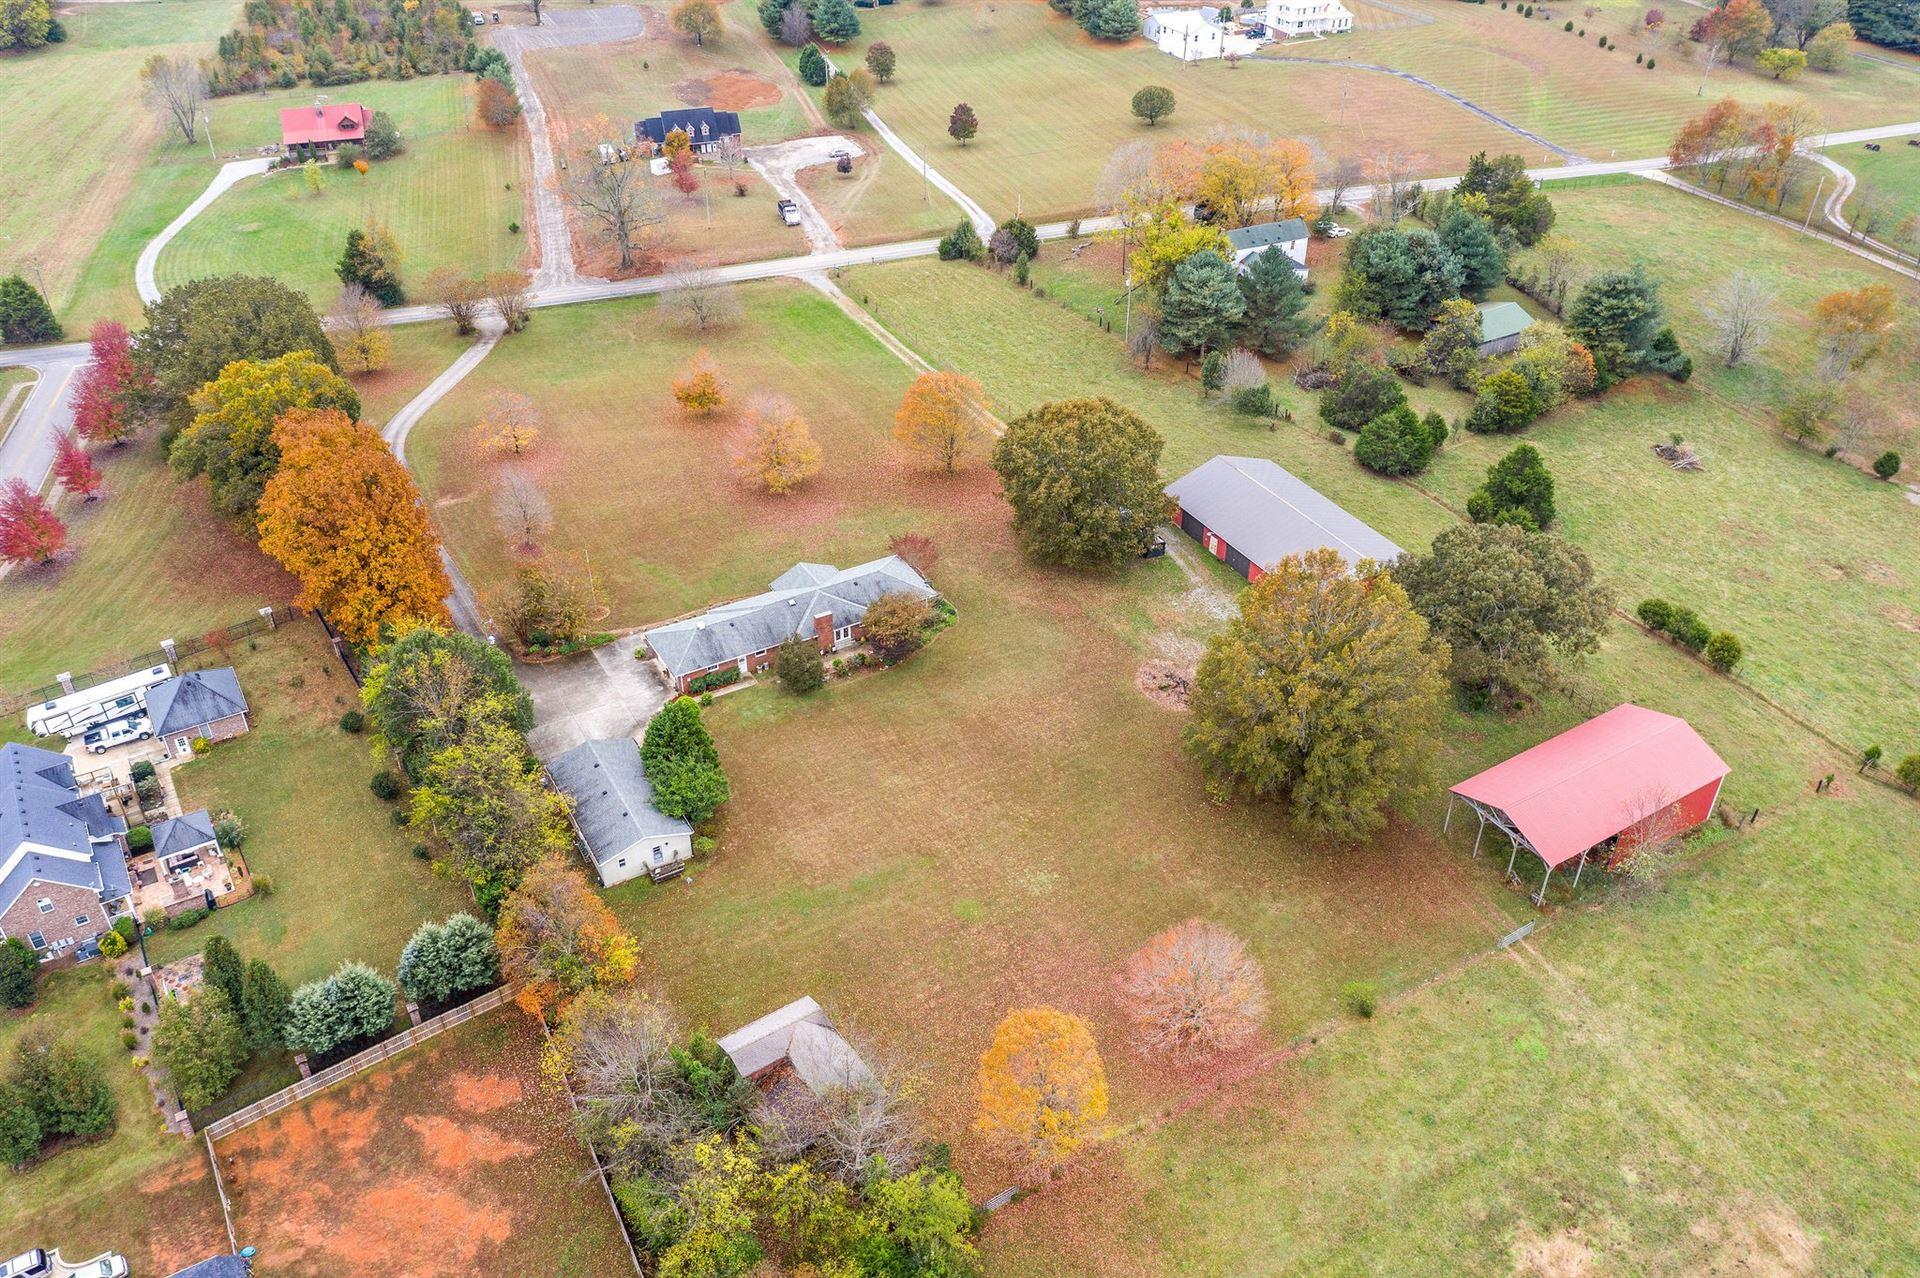 1100 Old Clarksville Pike, Pleasant View, TN 37146 - MLS#: 2232048